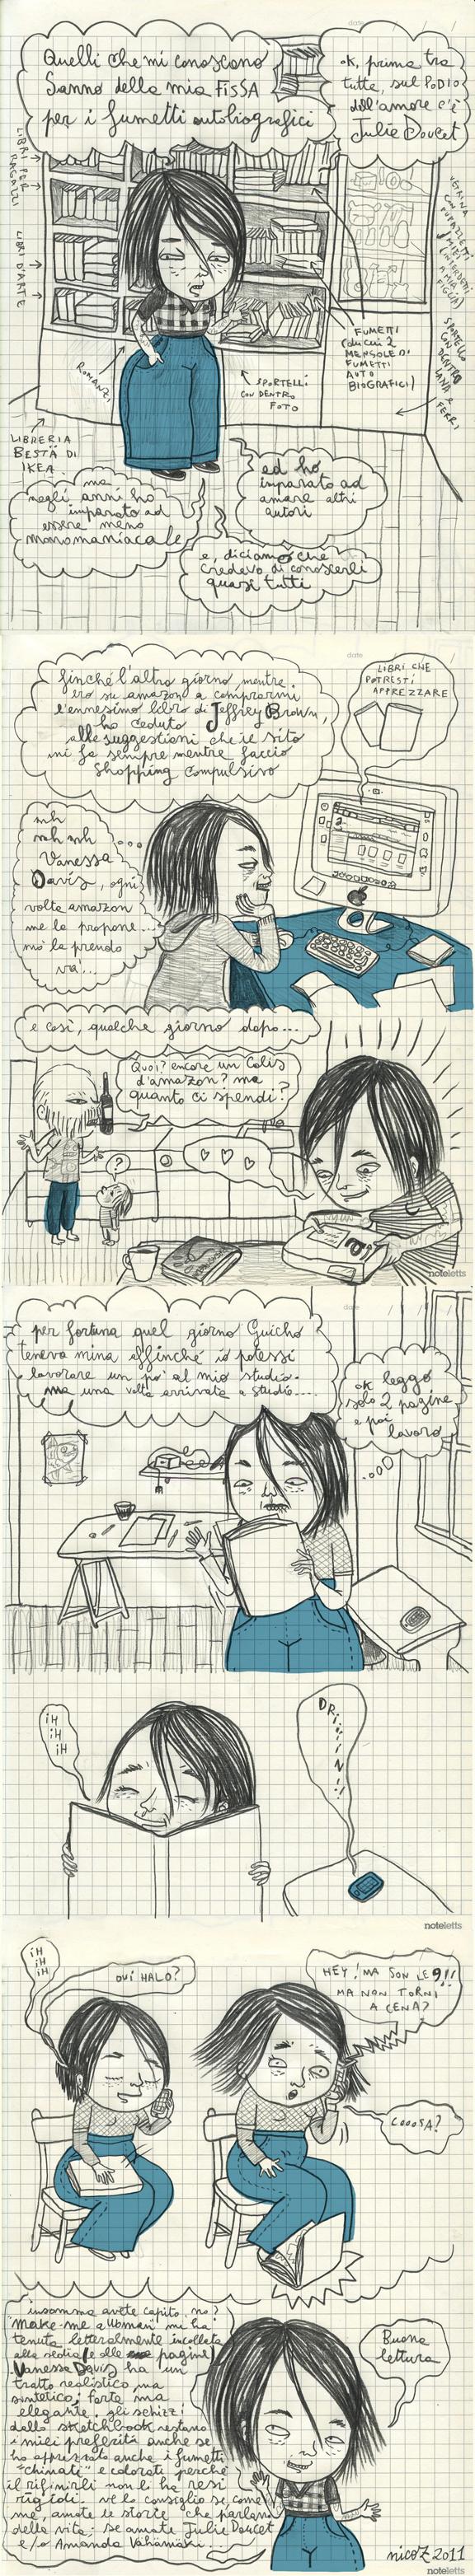 nicoz-vanessa_davisMIX_Recensioni A fumetti